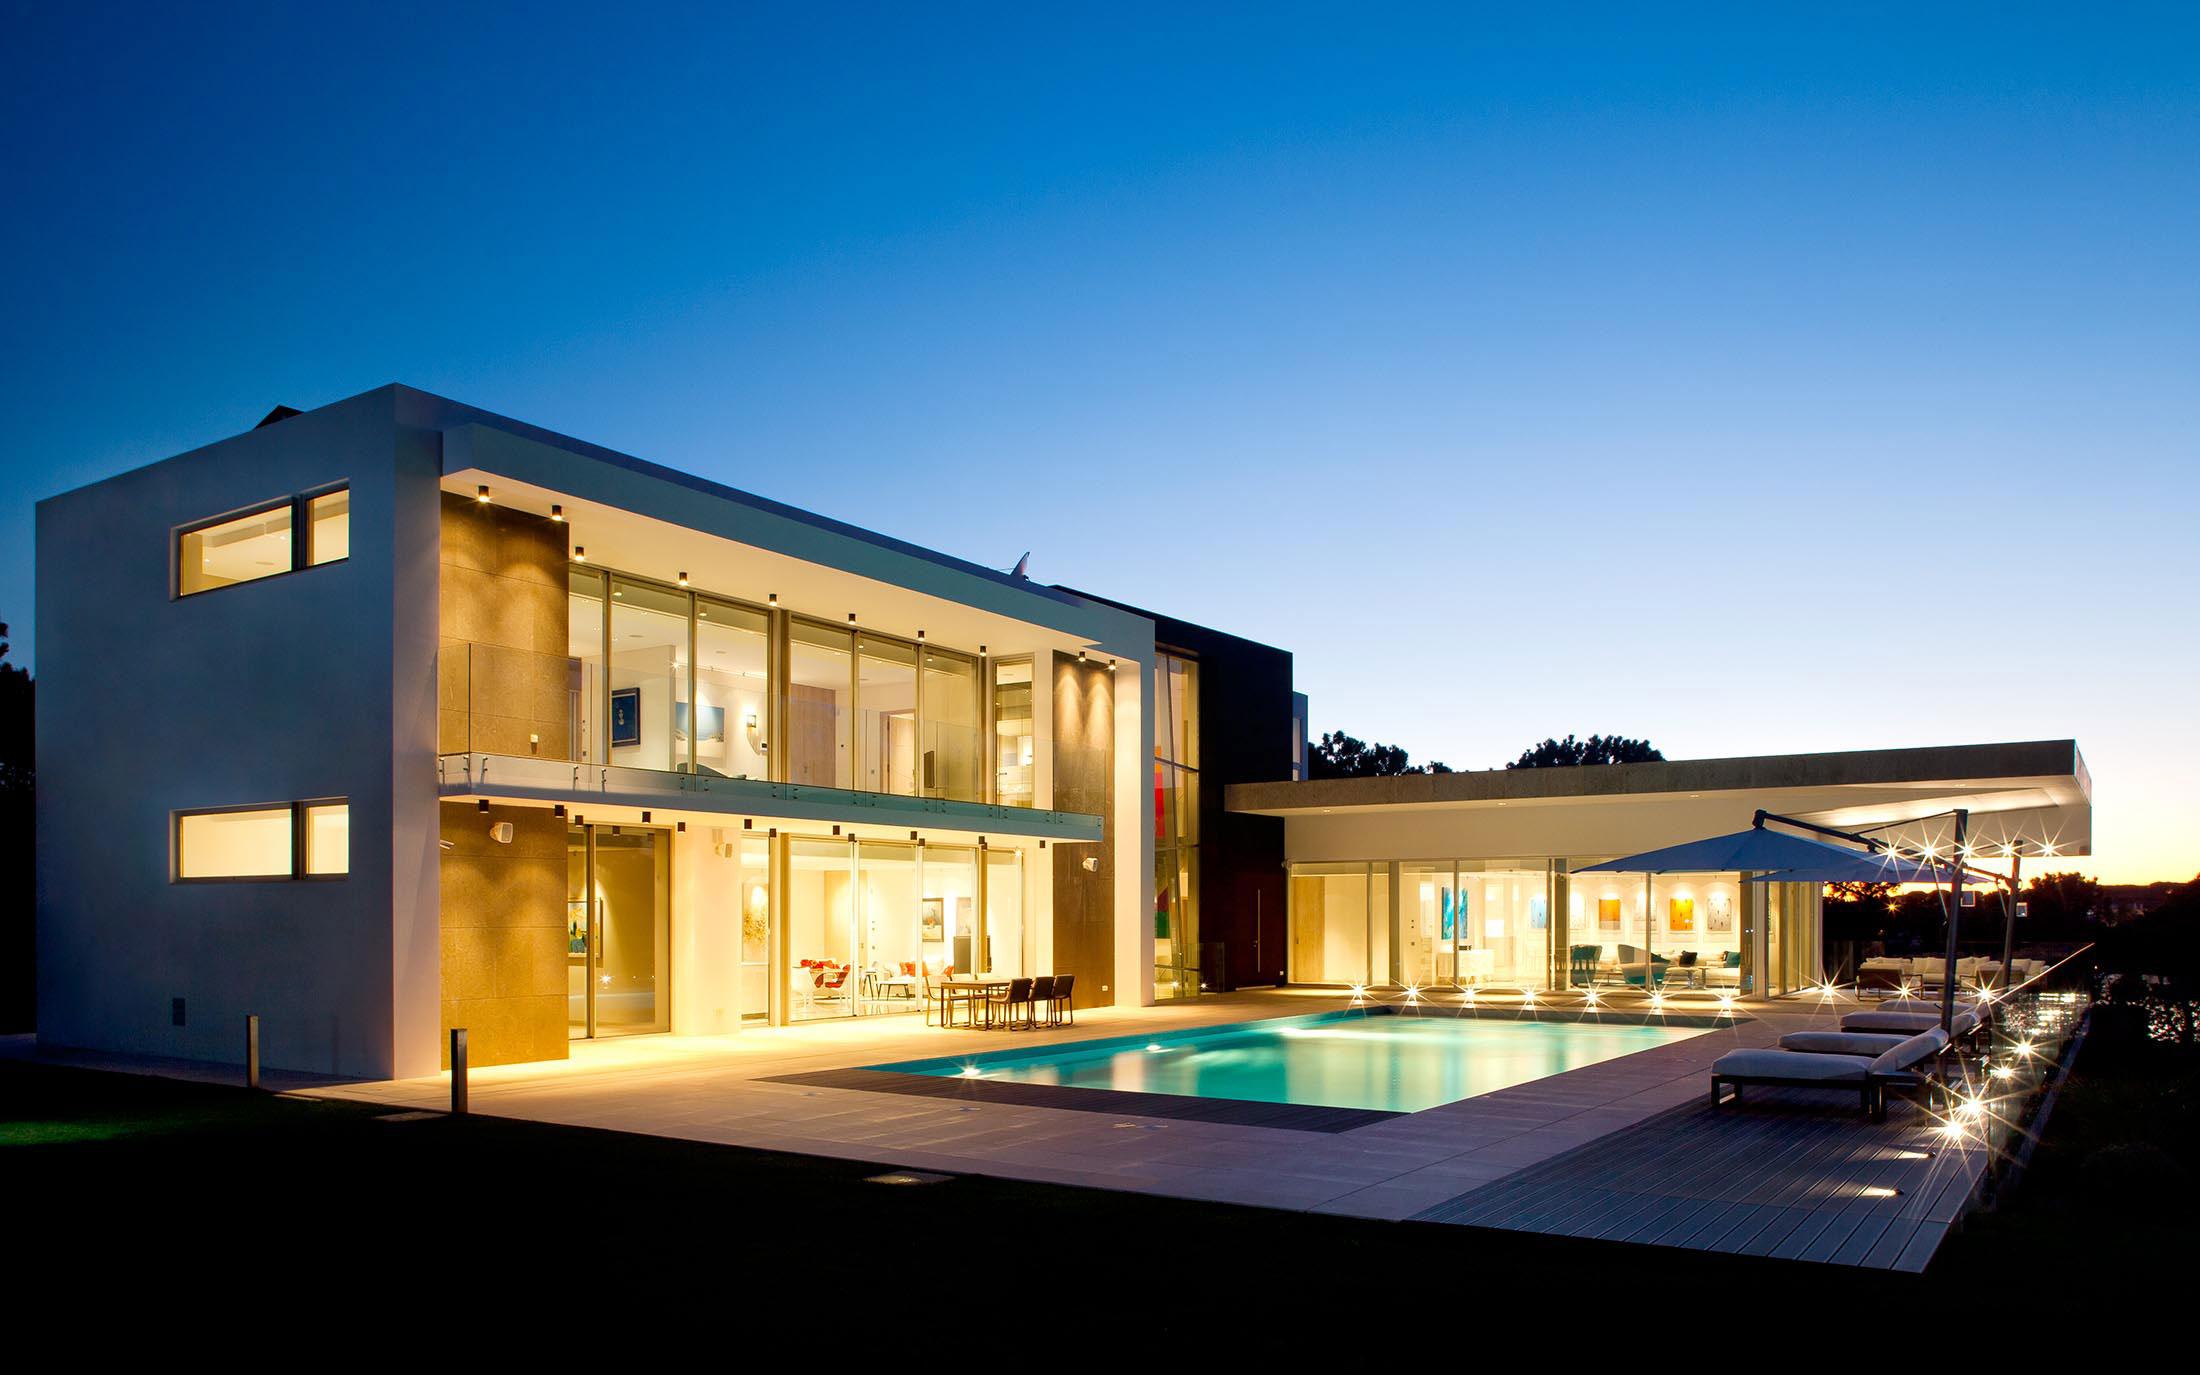 Pool, Terrace, Lighting, Family House in Portugal